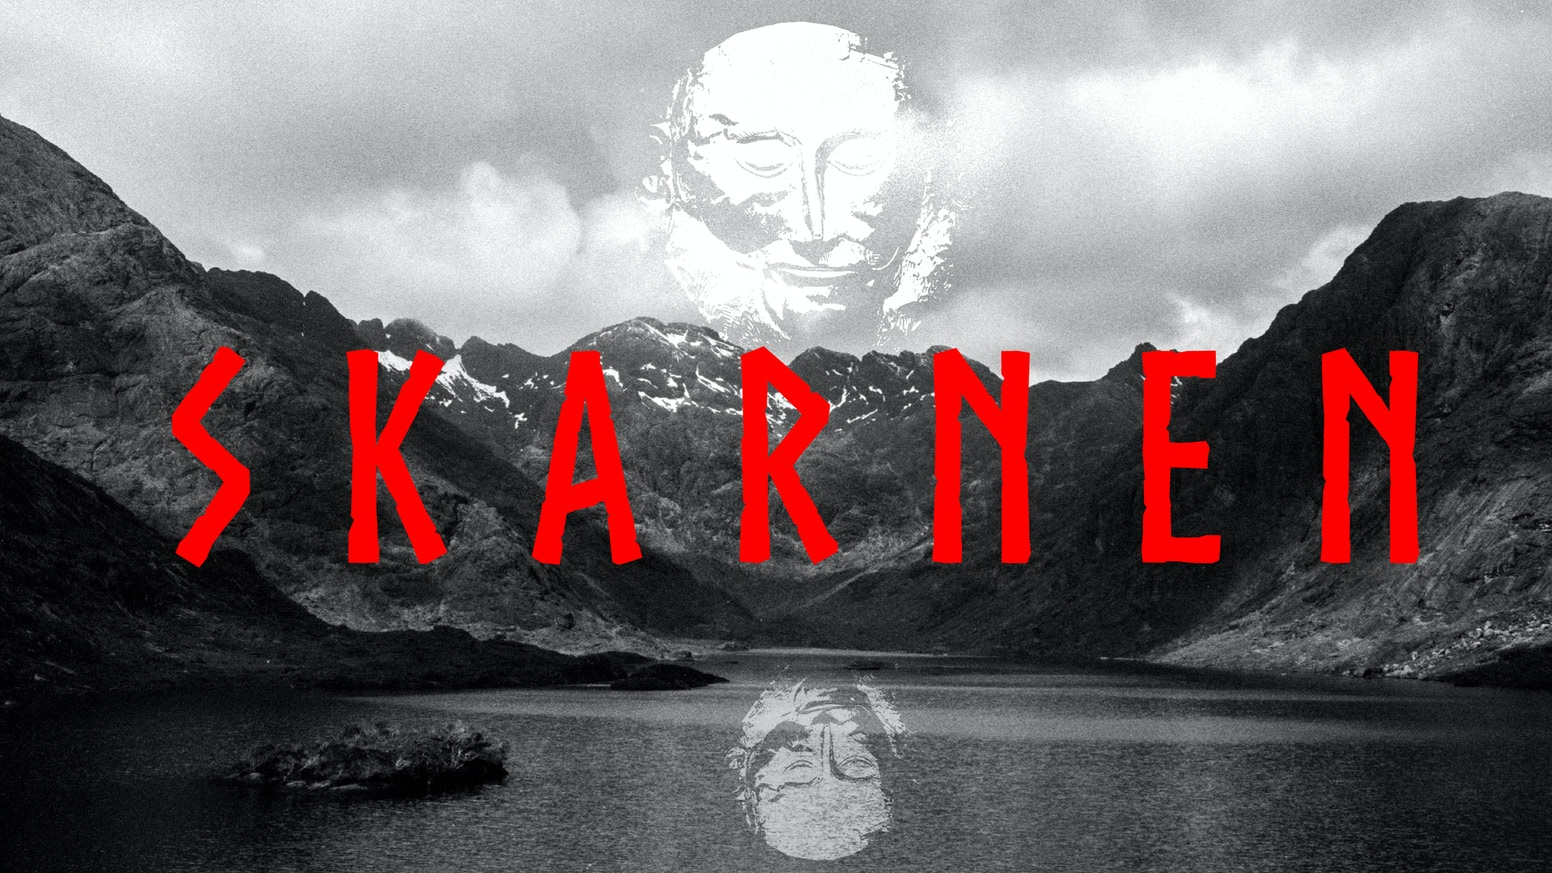 Skarnen Dark Ages Dramatic Fantasy Short Film On Skye By Tim